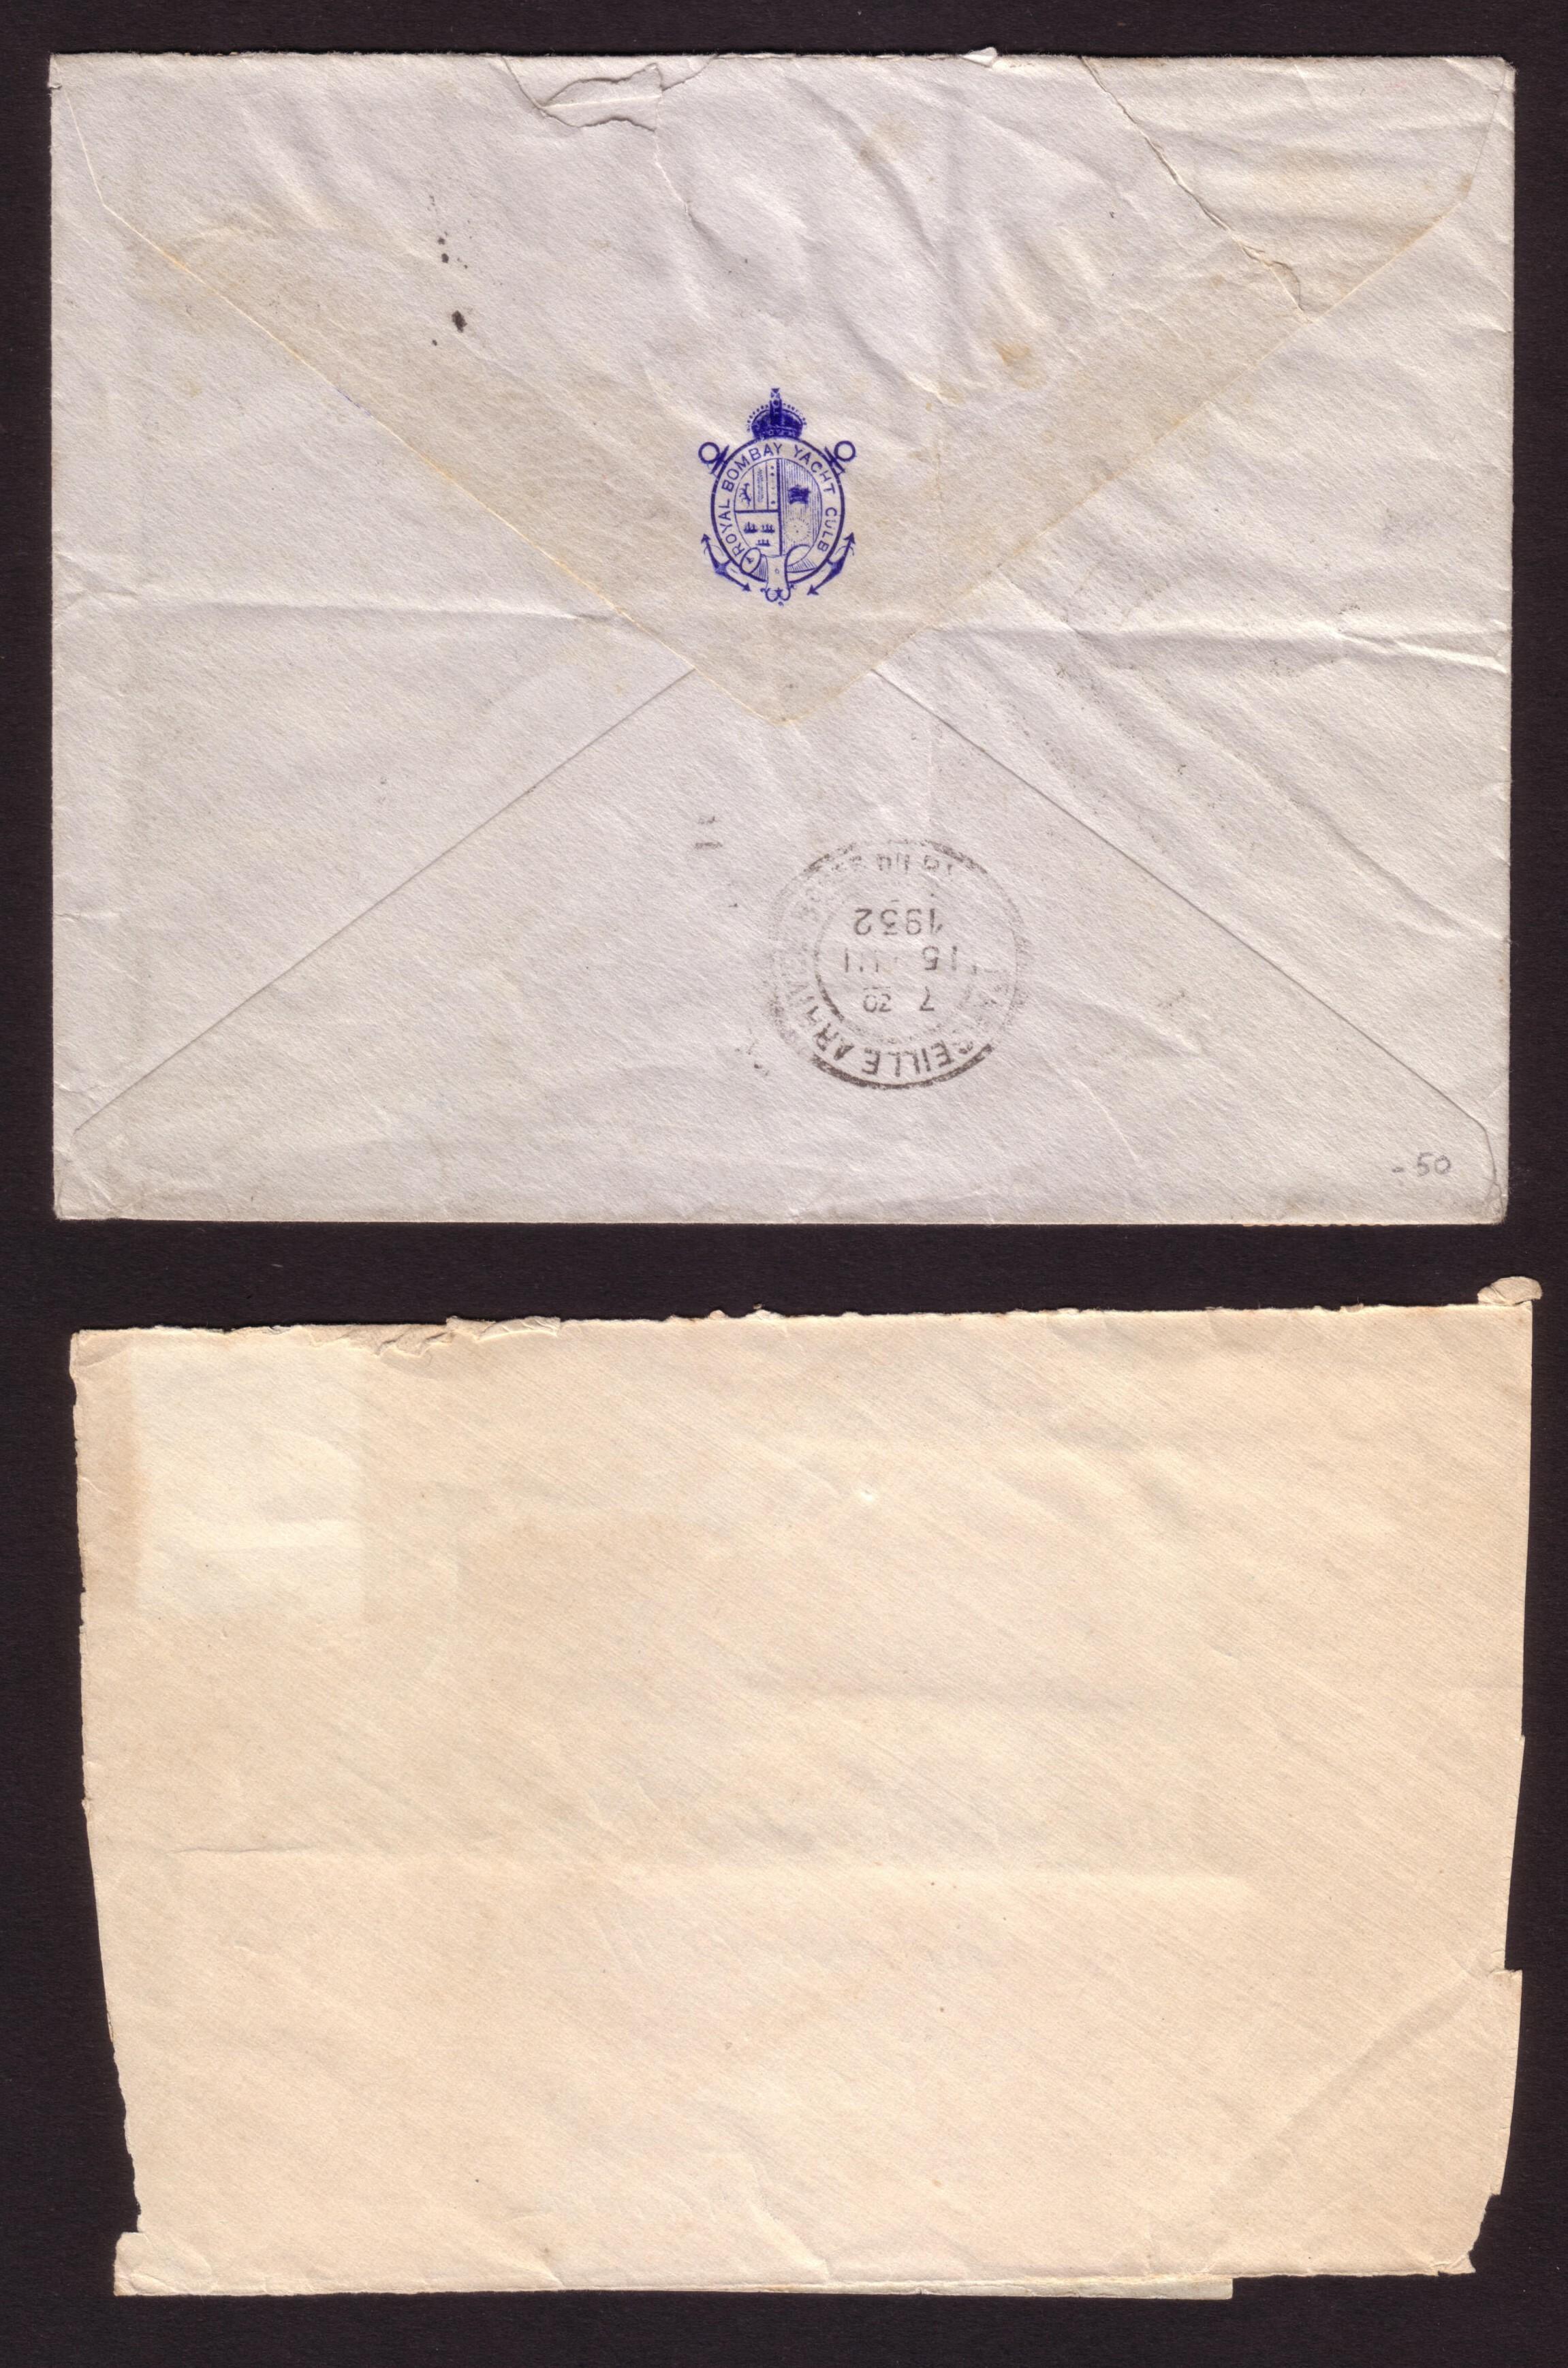 Lot 2589 - REGNO D'ITALIA - STORIA POSTALE Lots & Collections -  Ponte Auction House Stamps Auction 505